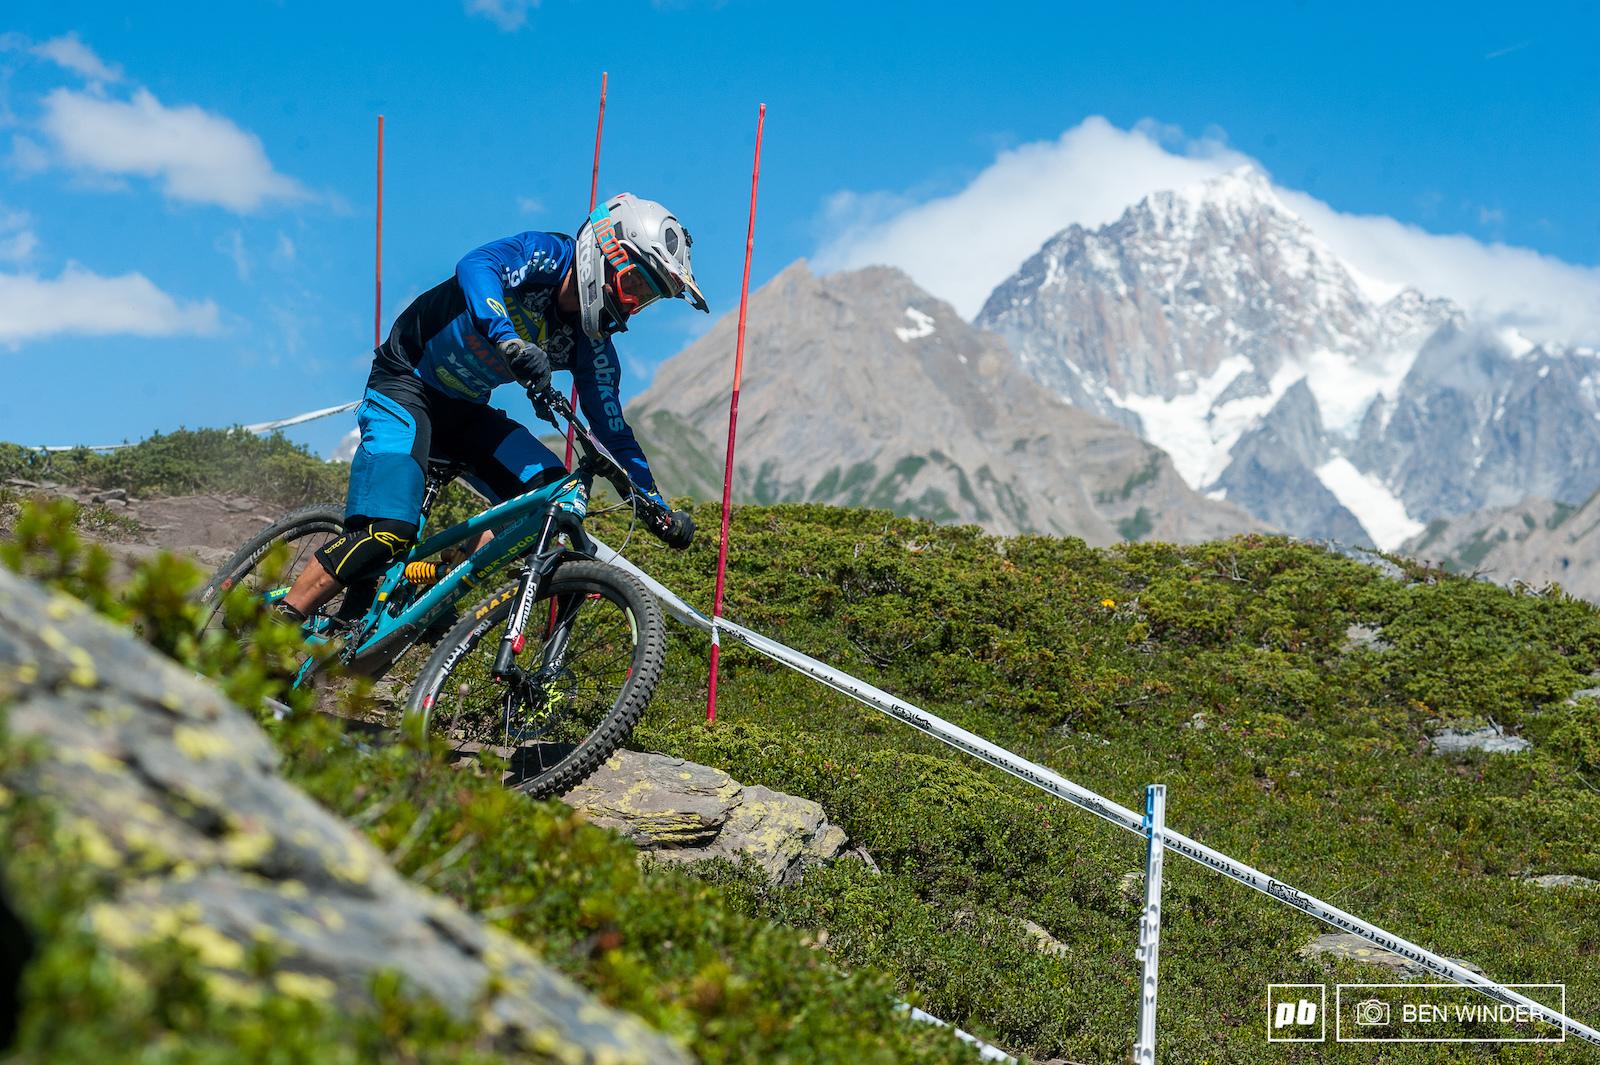 Davide Sottocornola powering past Monte Bianco.